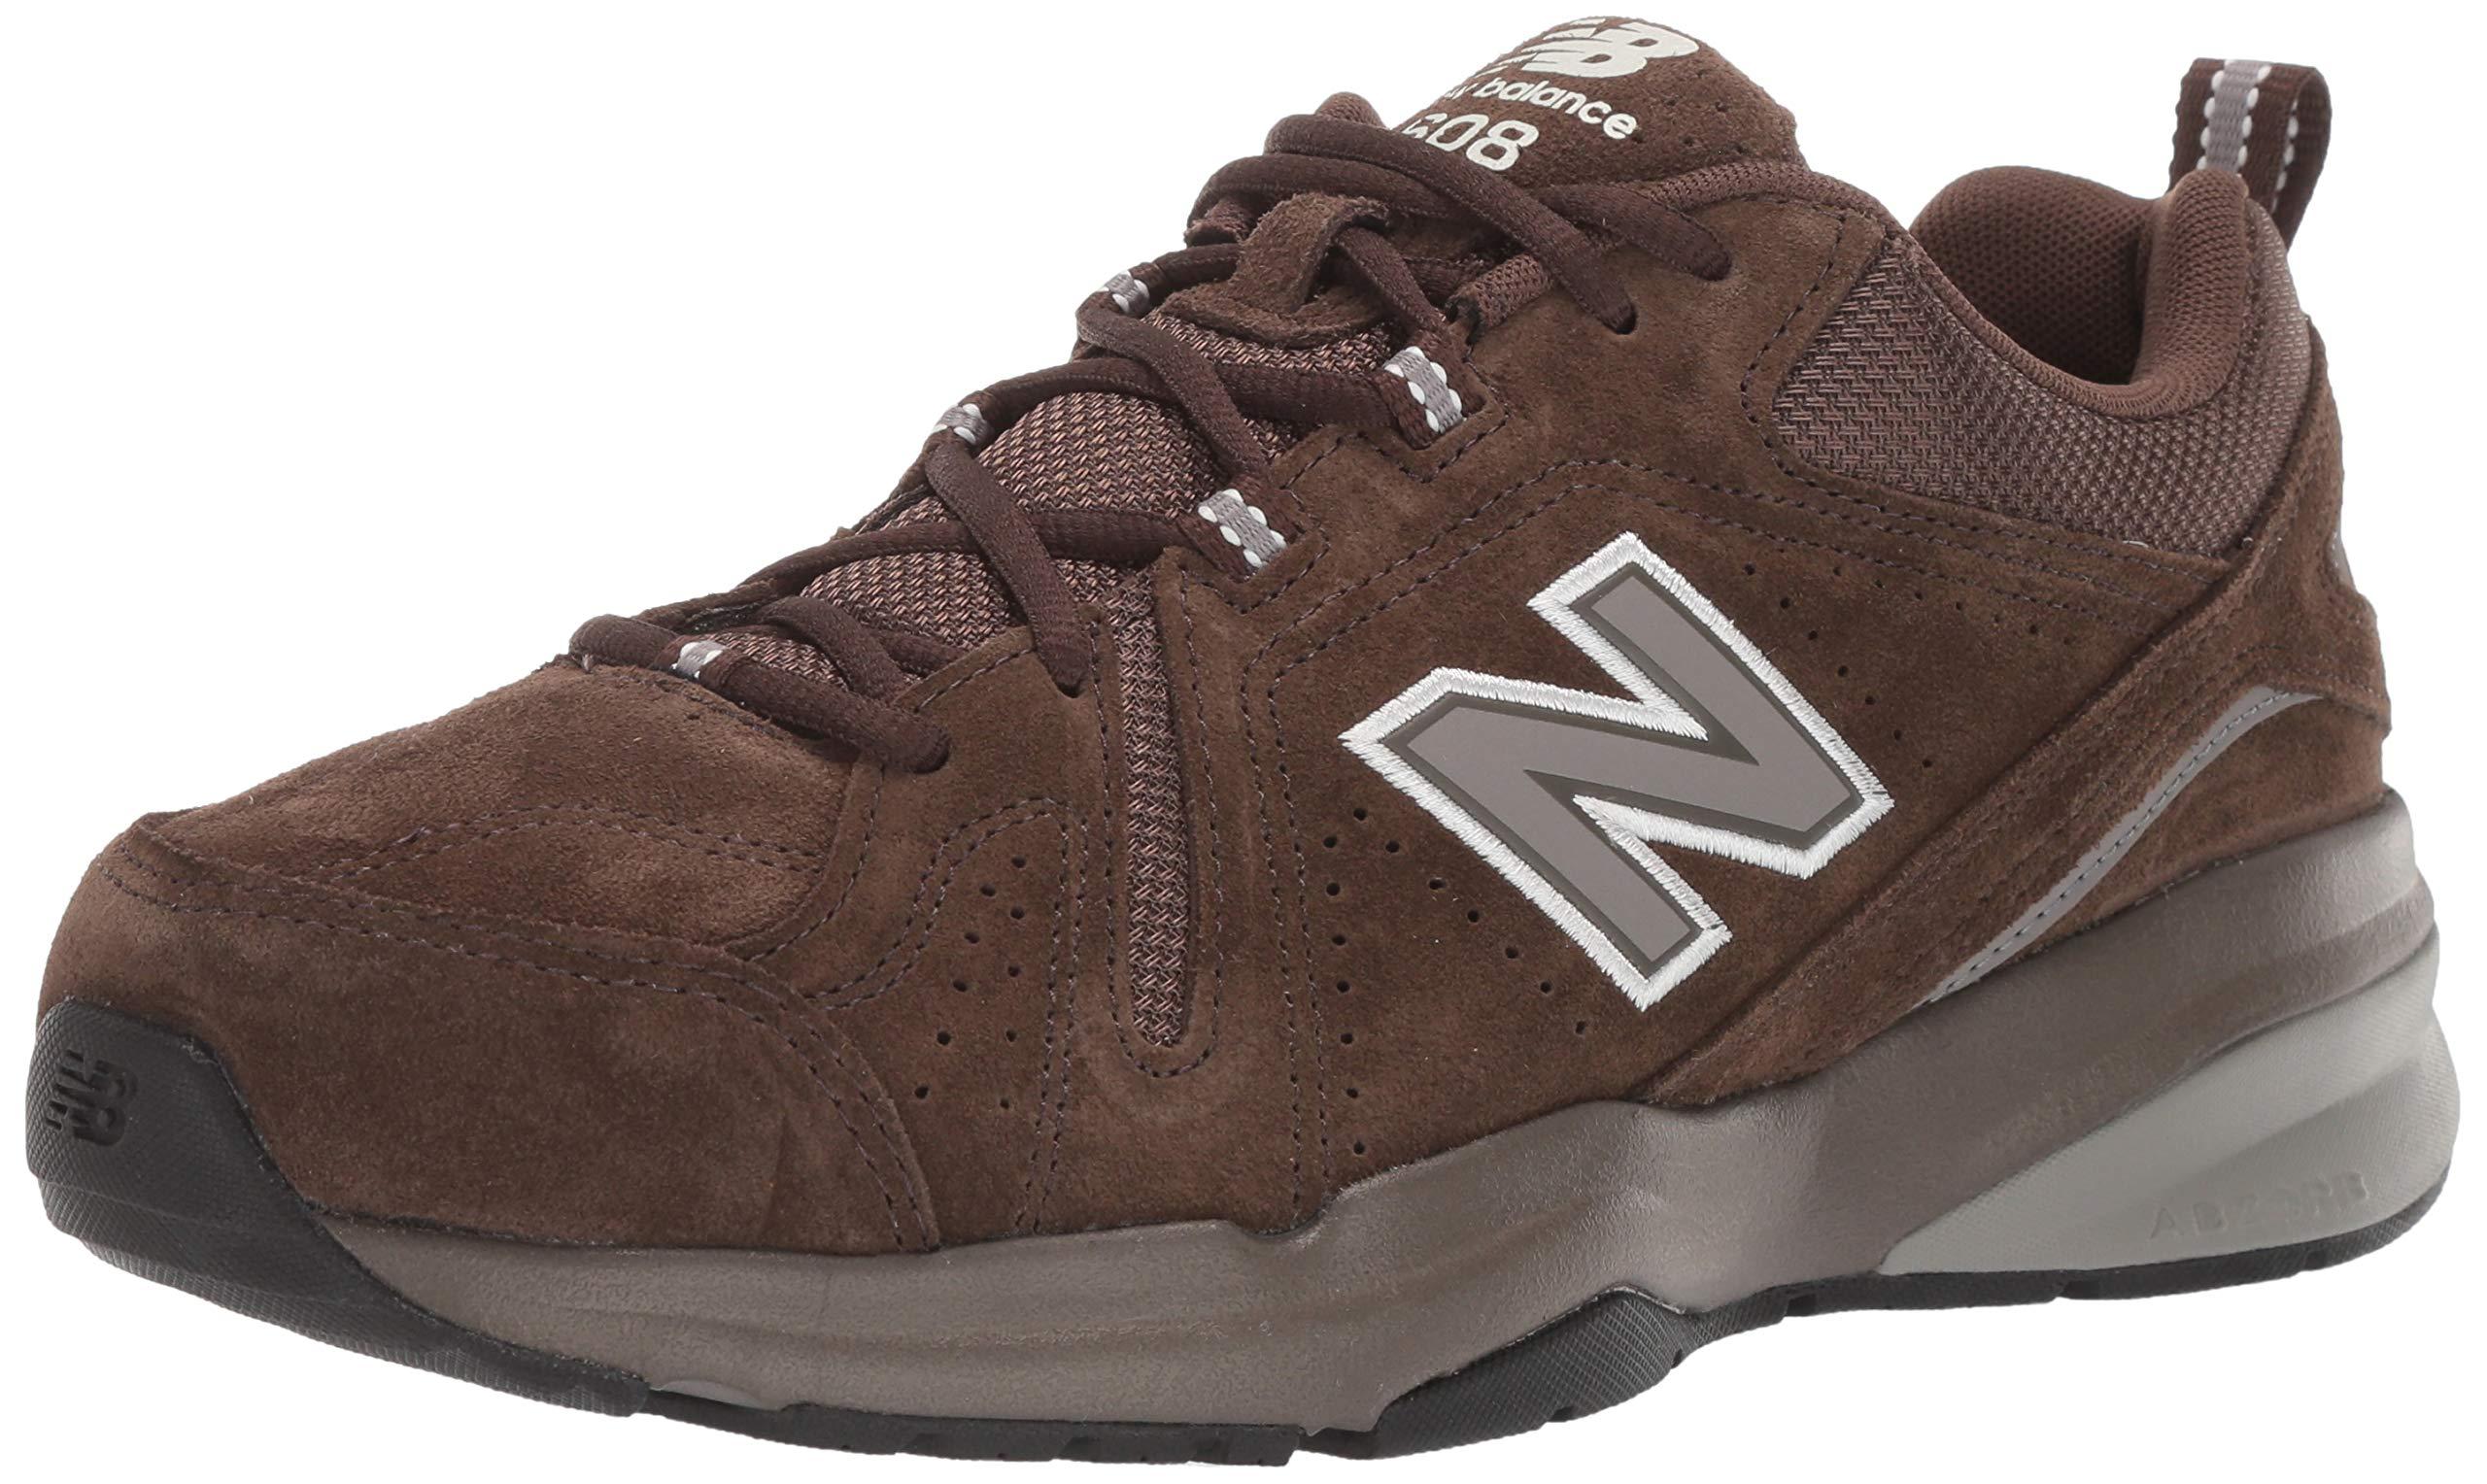 New Balance Men's 608v5 Casual Comfort Walking Shoe, Chocolate Brown/White, 6.5 D US